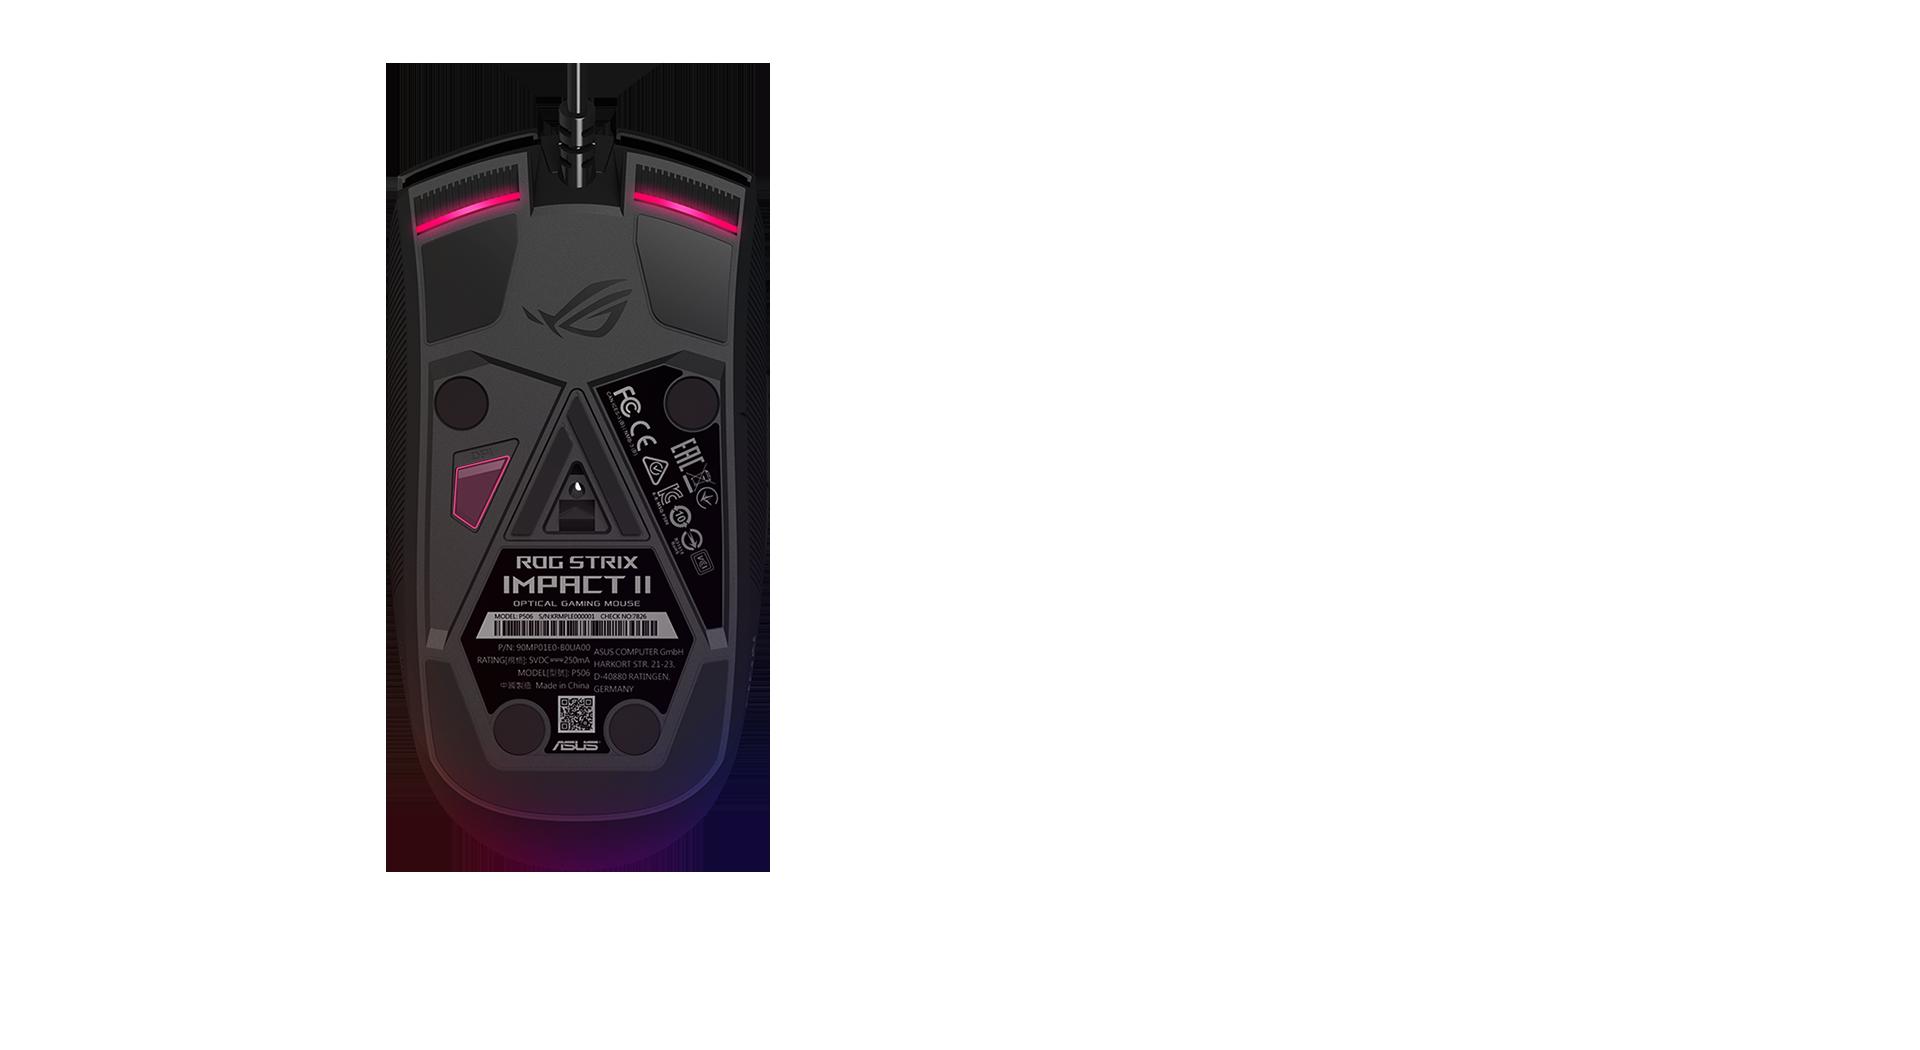 ROG Strix Impact II | Keyboards & Mice | ASUS Indonesia